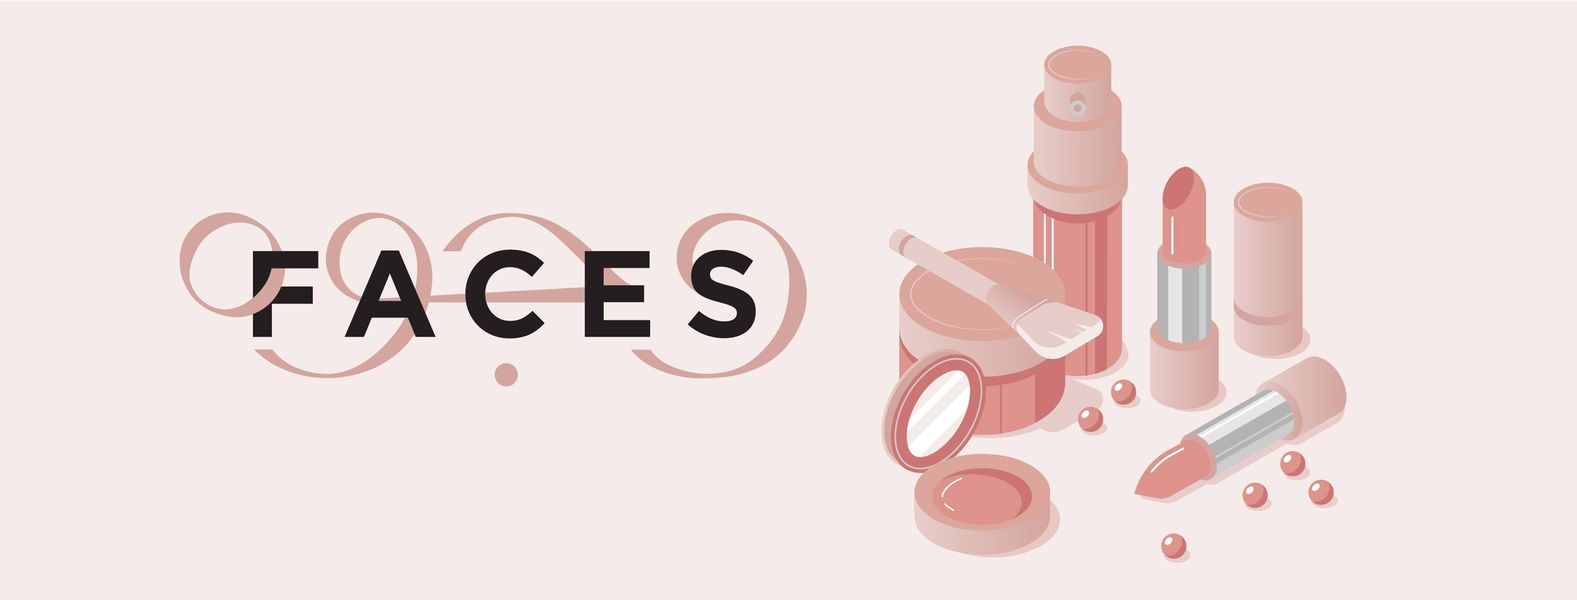 FACES.Com Promo Codes.jpg